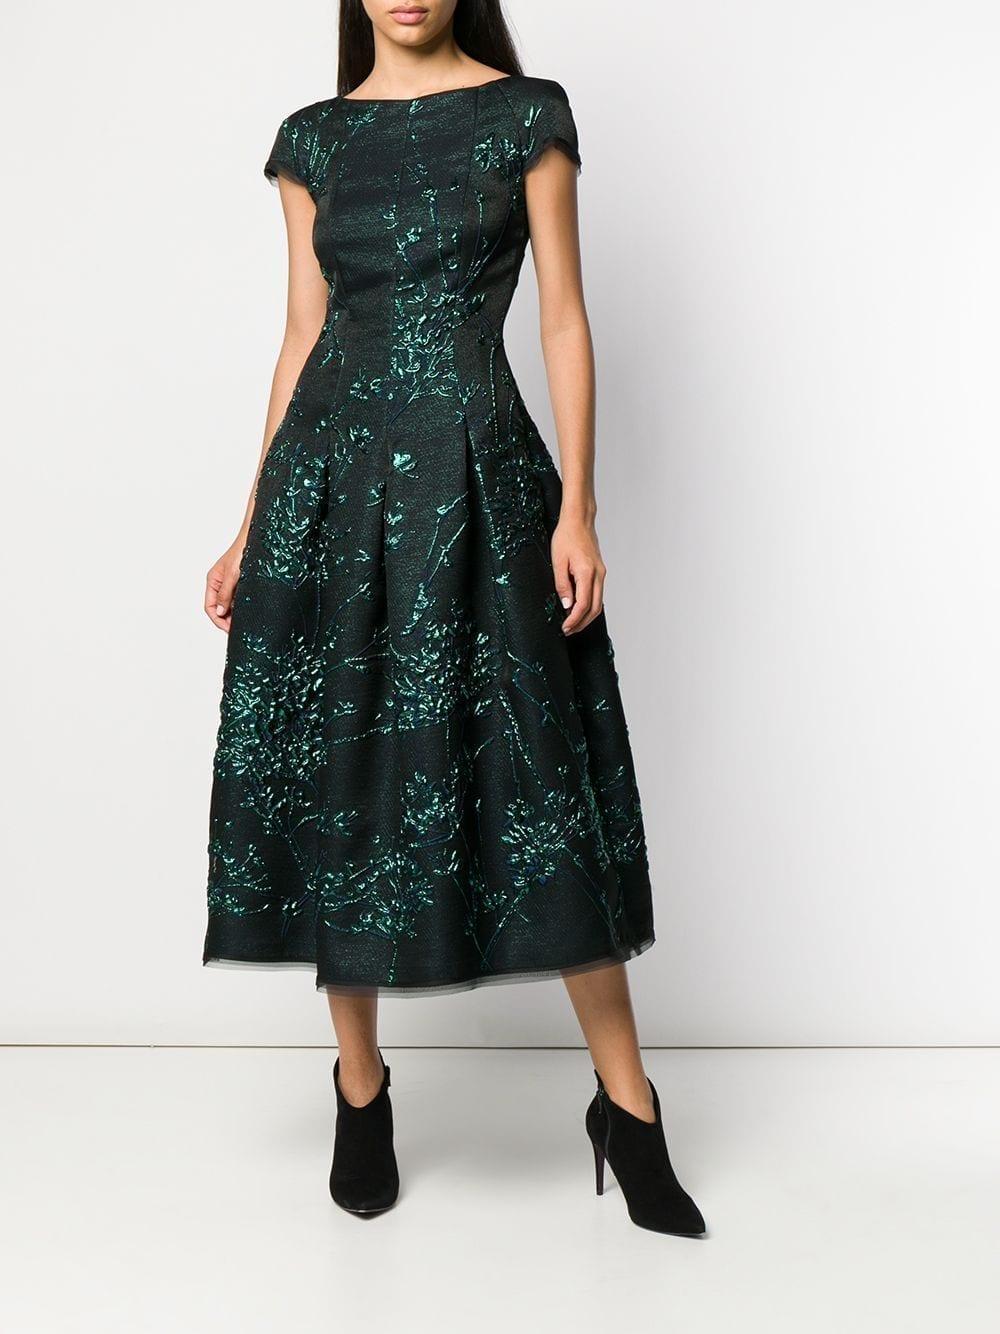 50b103aea95e4 TALBOT RUNHOF Portsmith Silk Jackquard Dress - We Select Dresses